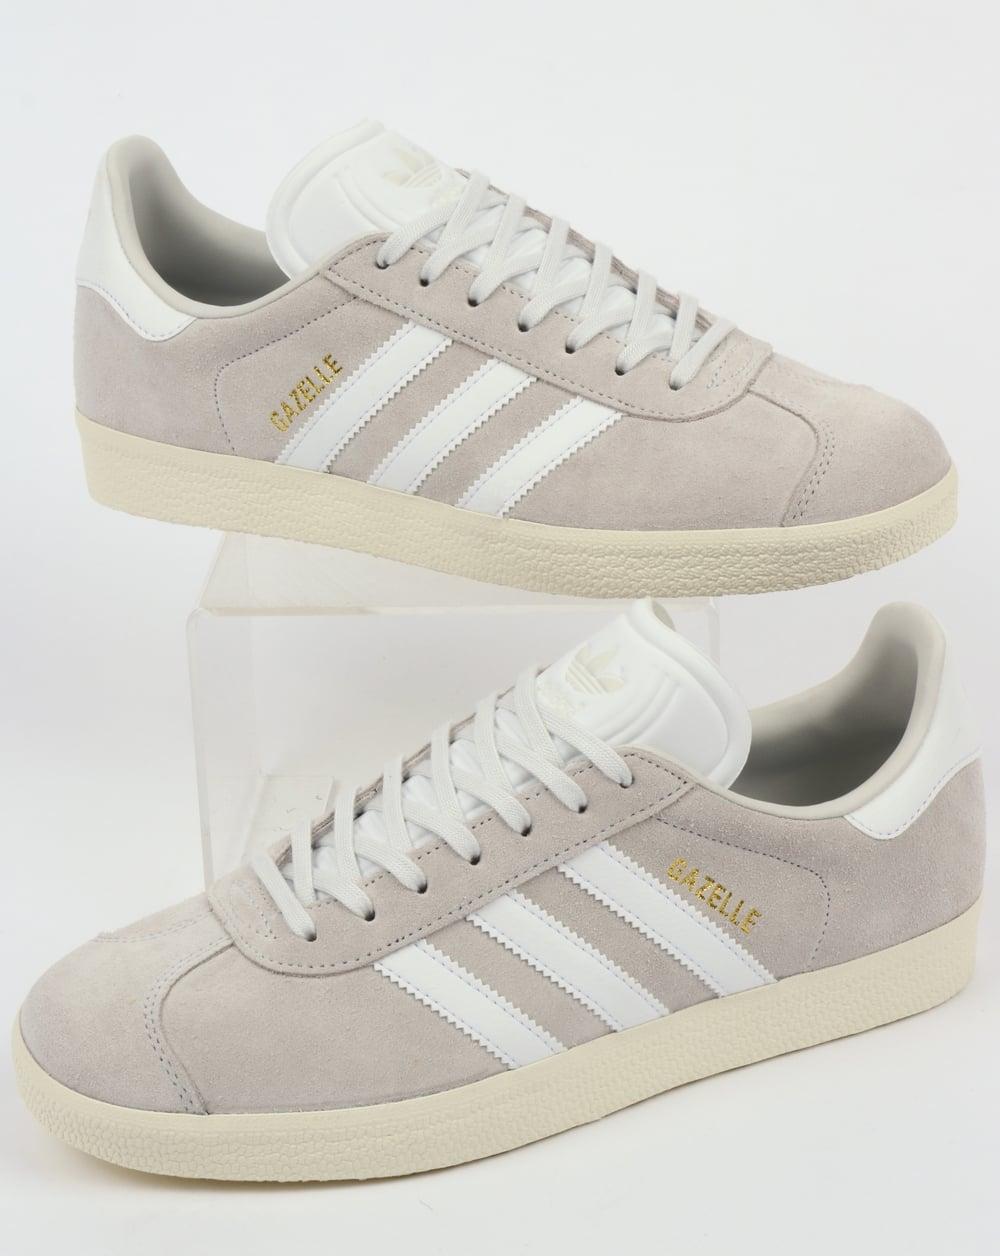 100% authentique c46e3 af35a Adidas Gazelle Trainers Crystal White